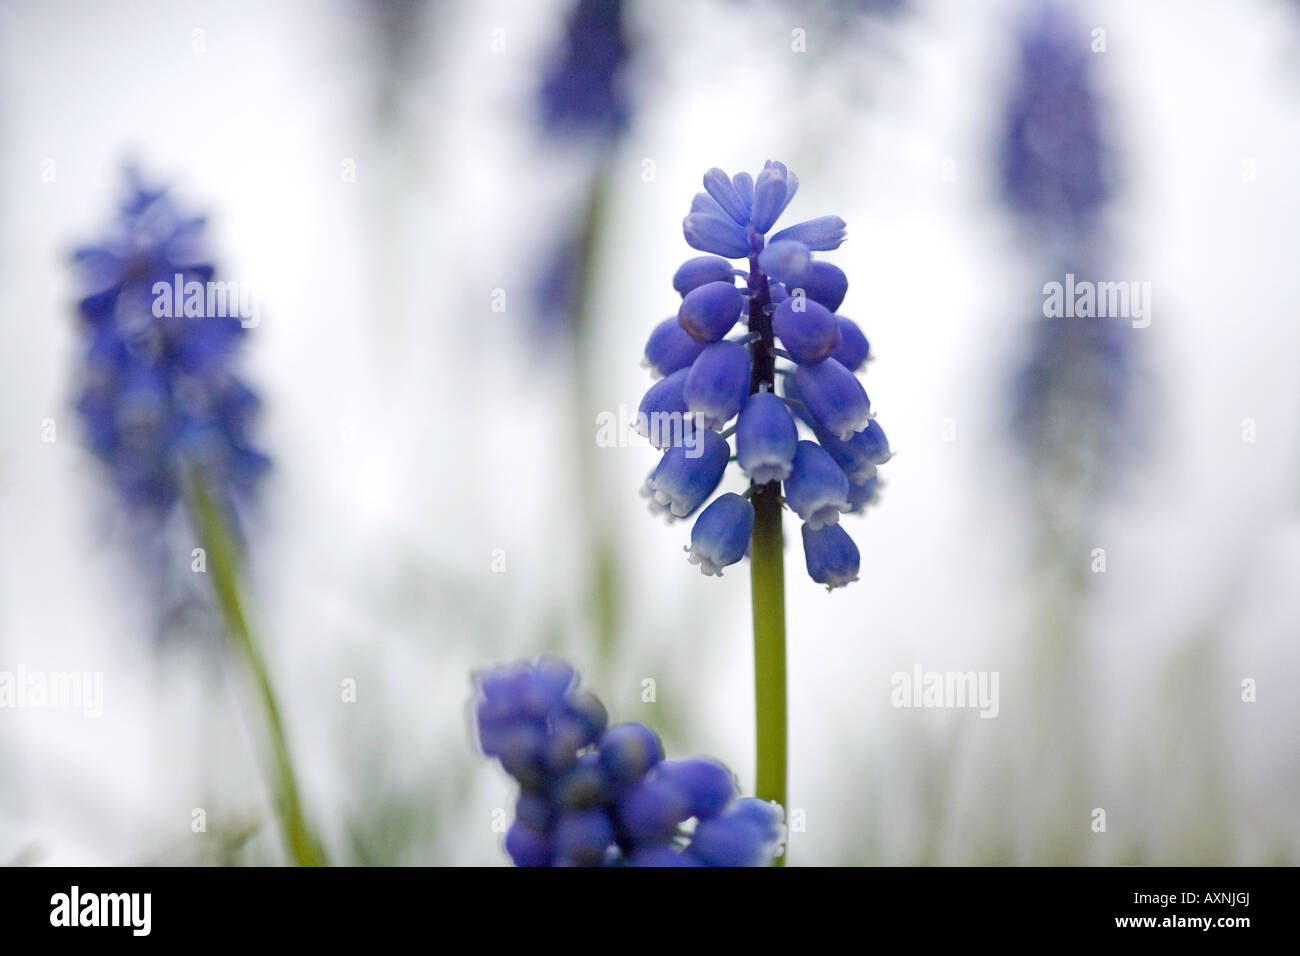 Muscari Armeniacum, giacinto d'uva che cresce in neve Immagini Stock